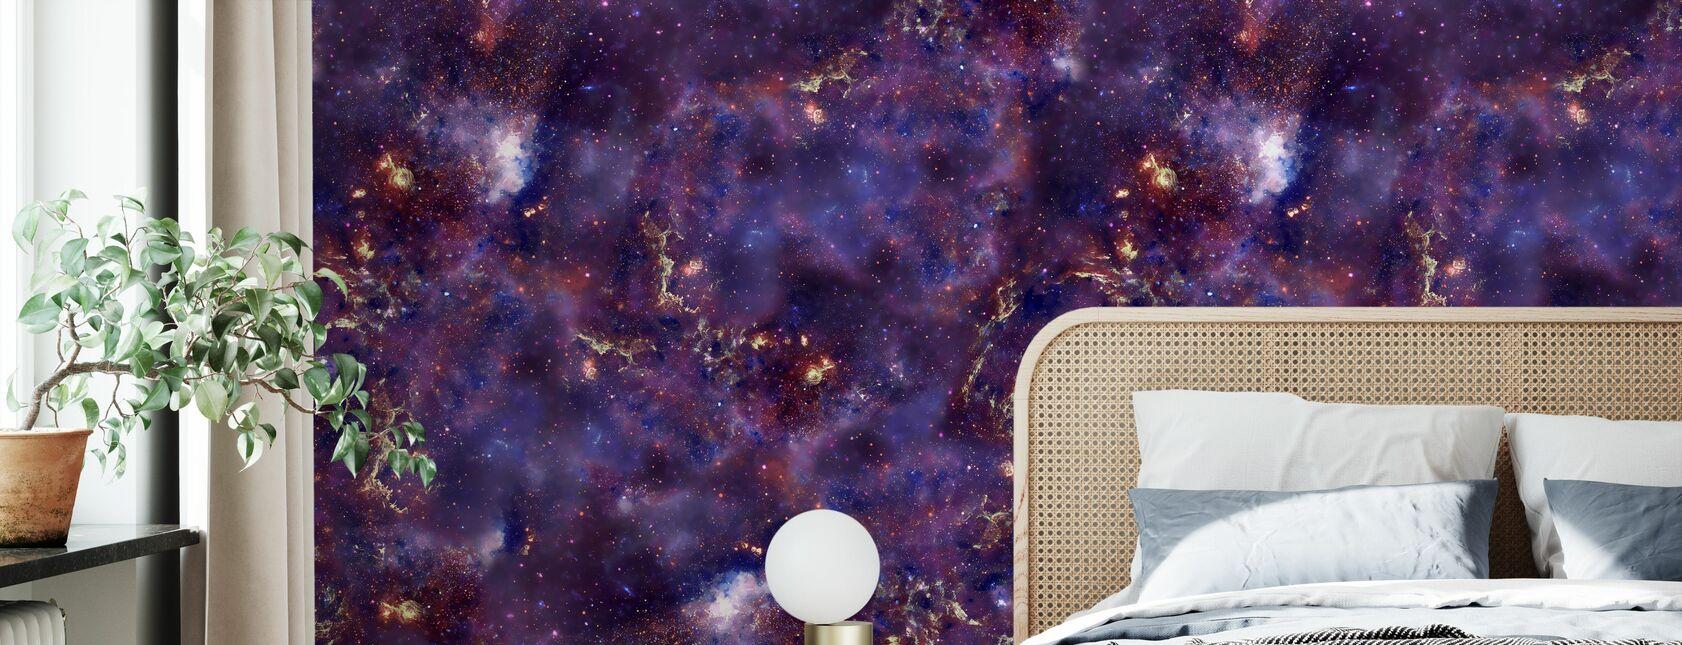 Galaxy Lord - Wallpaper - Bedroom